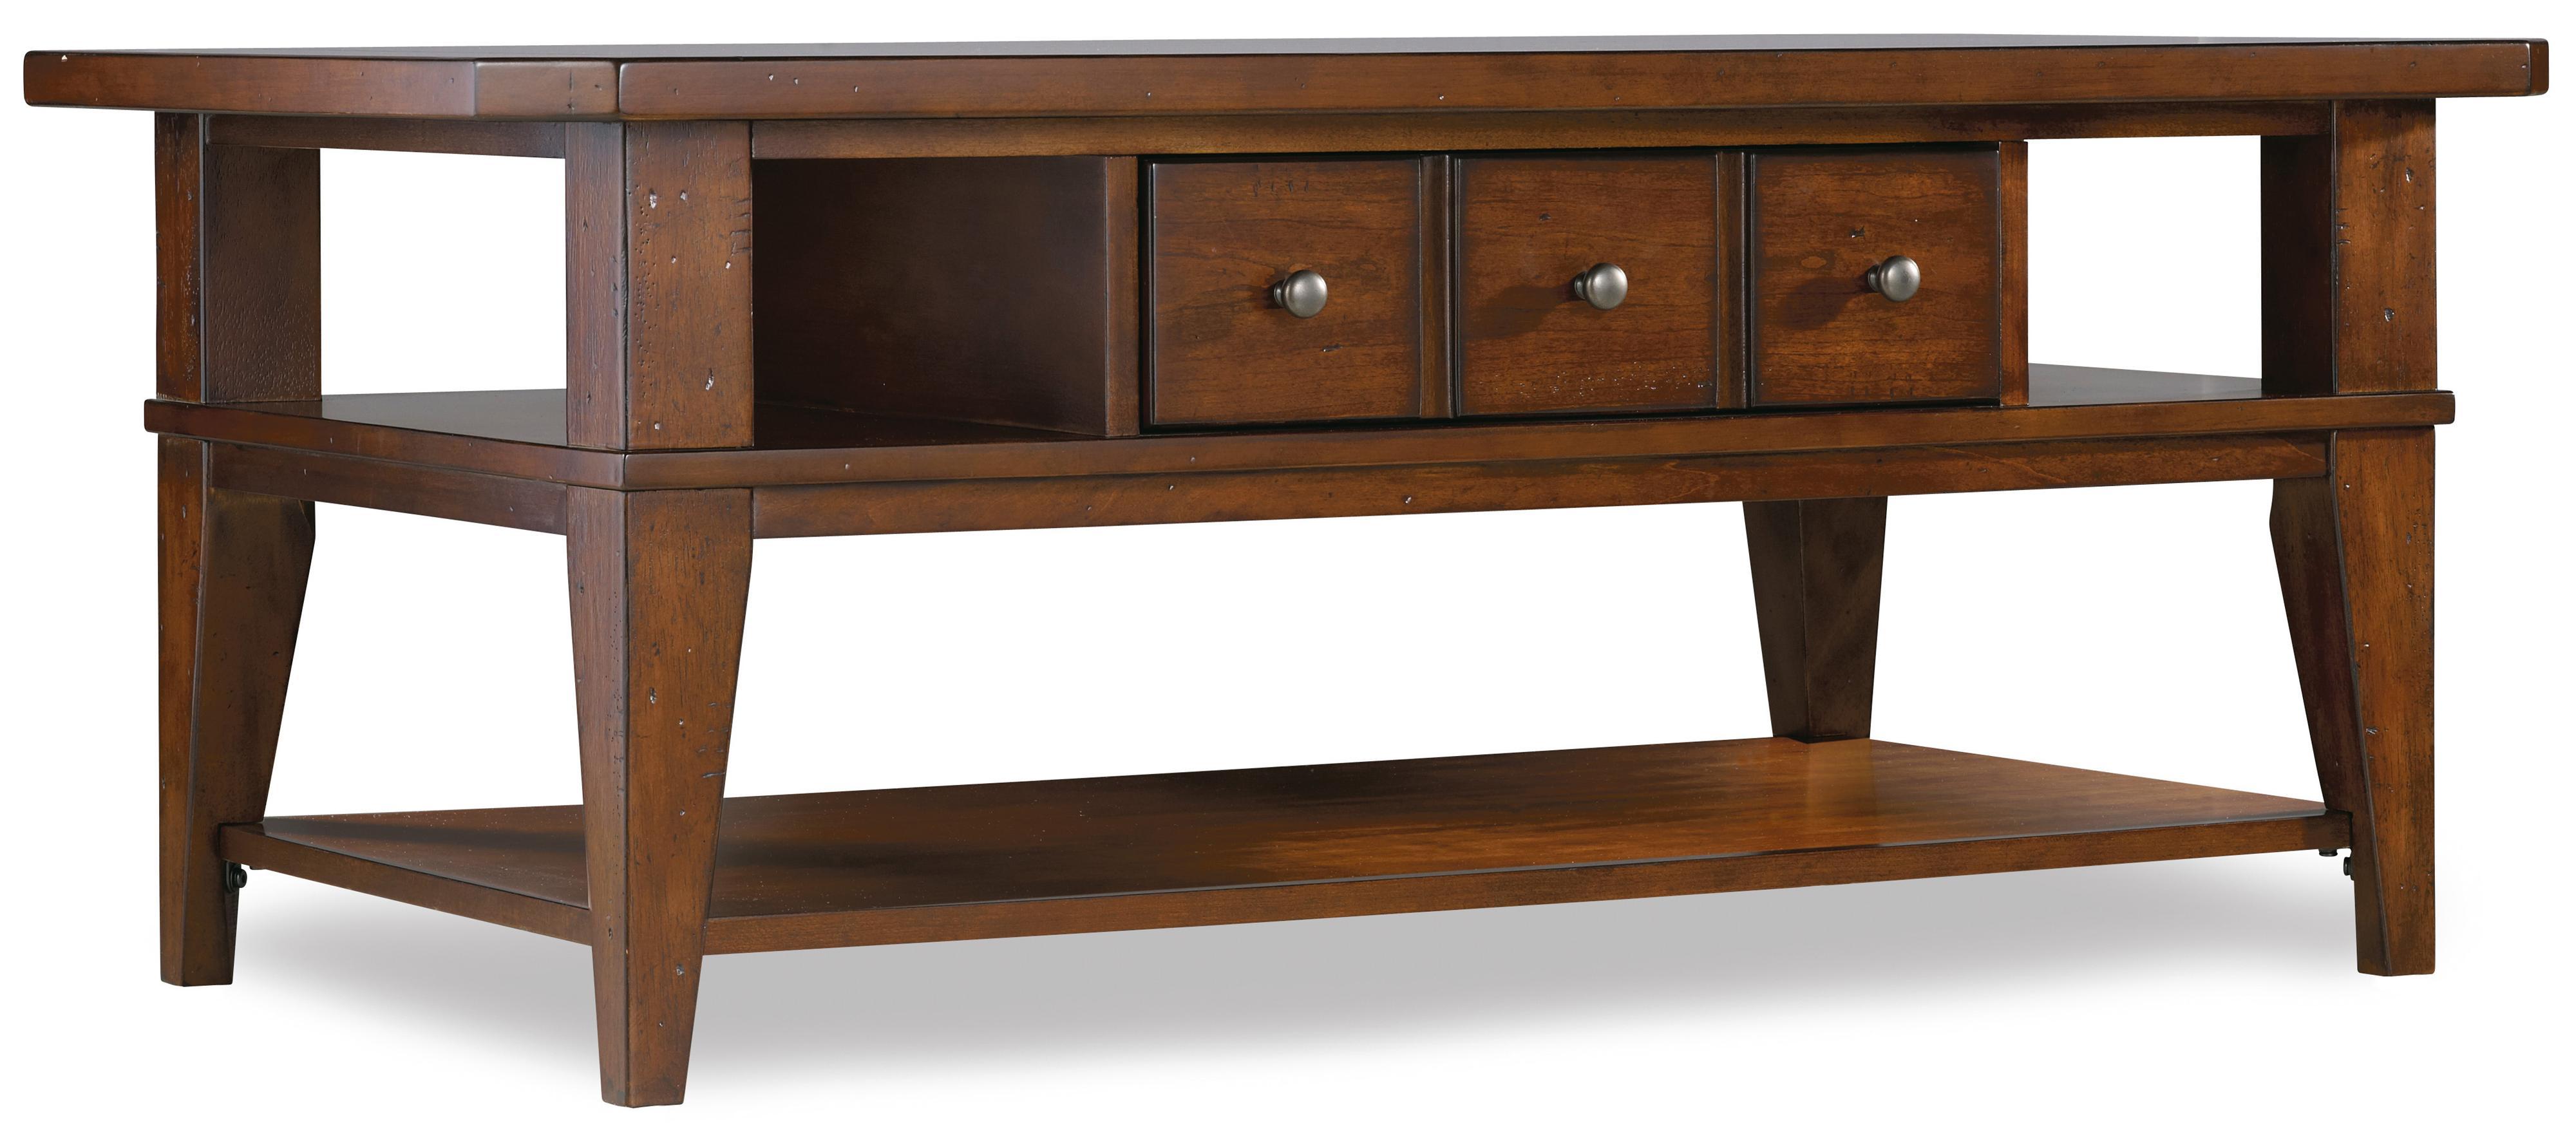 Hooker Furniture Wendover Rectangle Cocktail Table - Item Number: 1037-81110